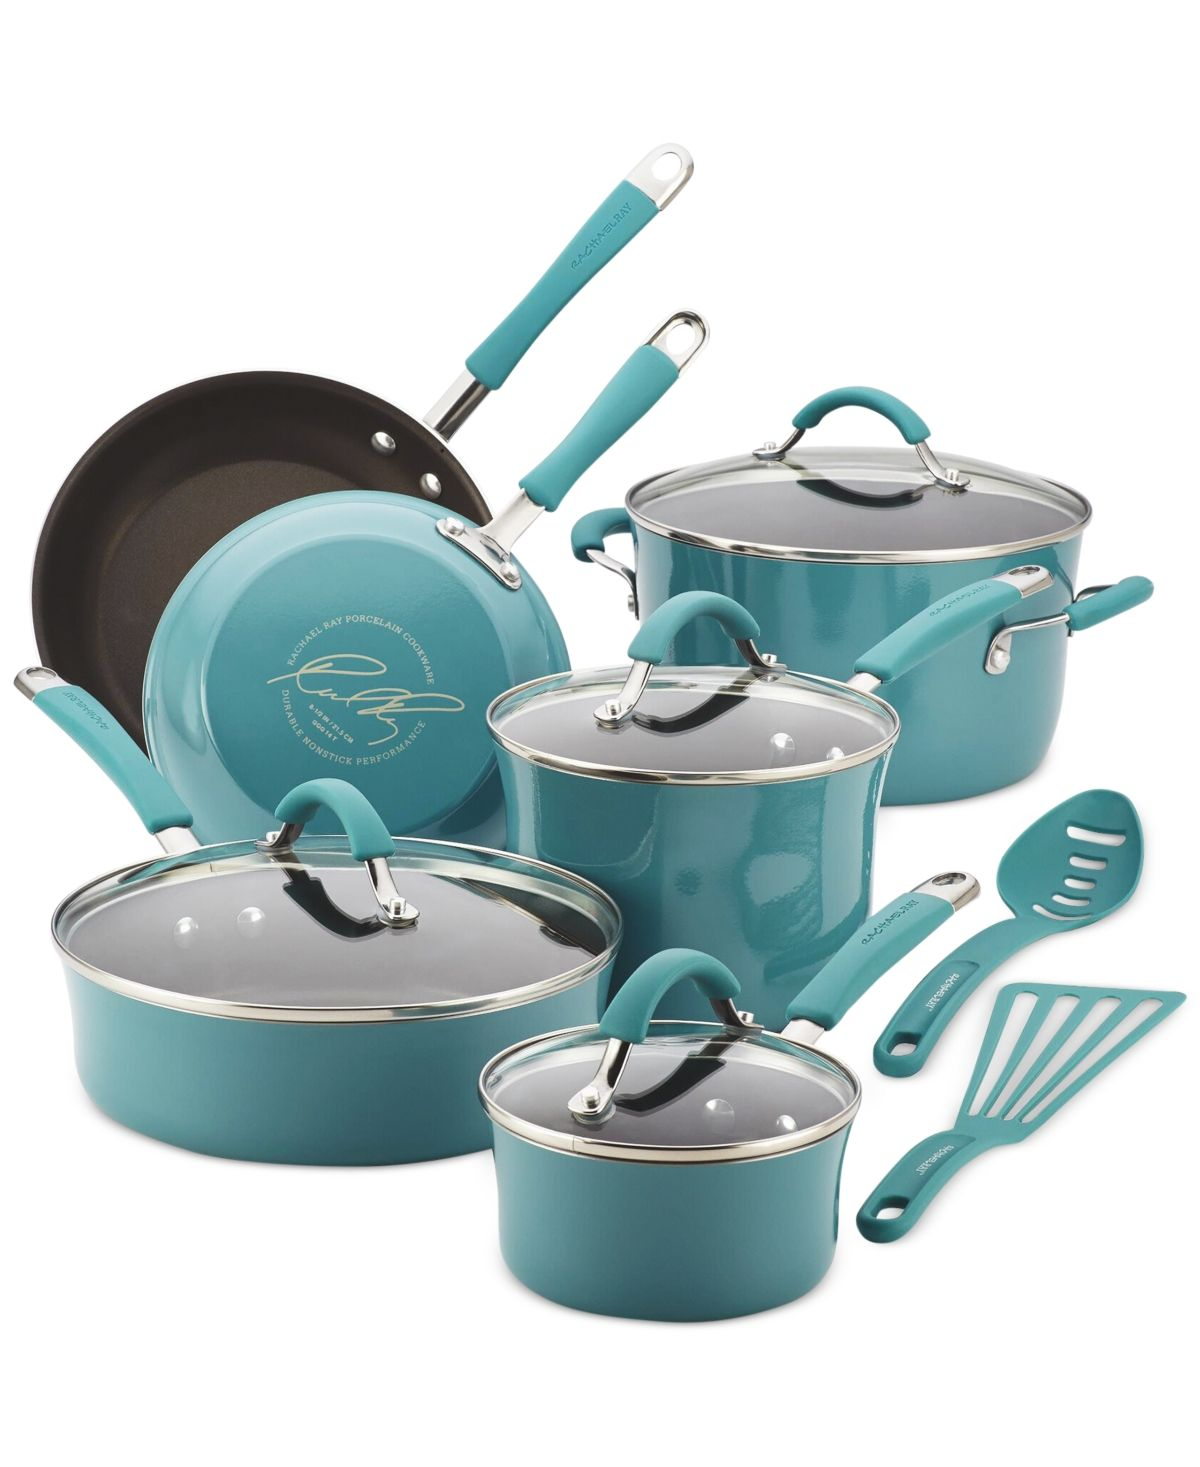 Rachael Ray Cucina Hard Enamel Nonstick 12Piece Cookware